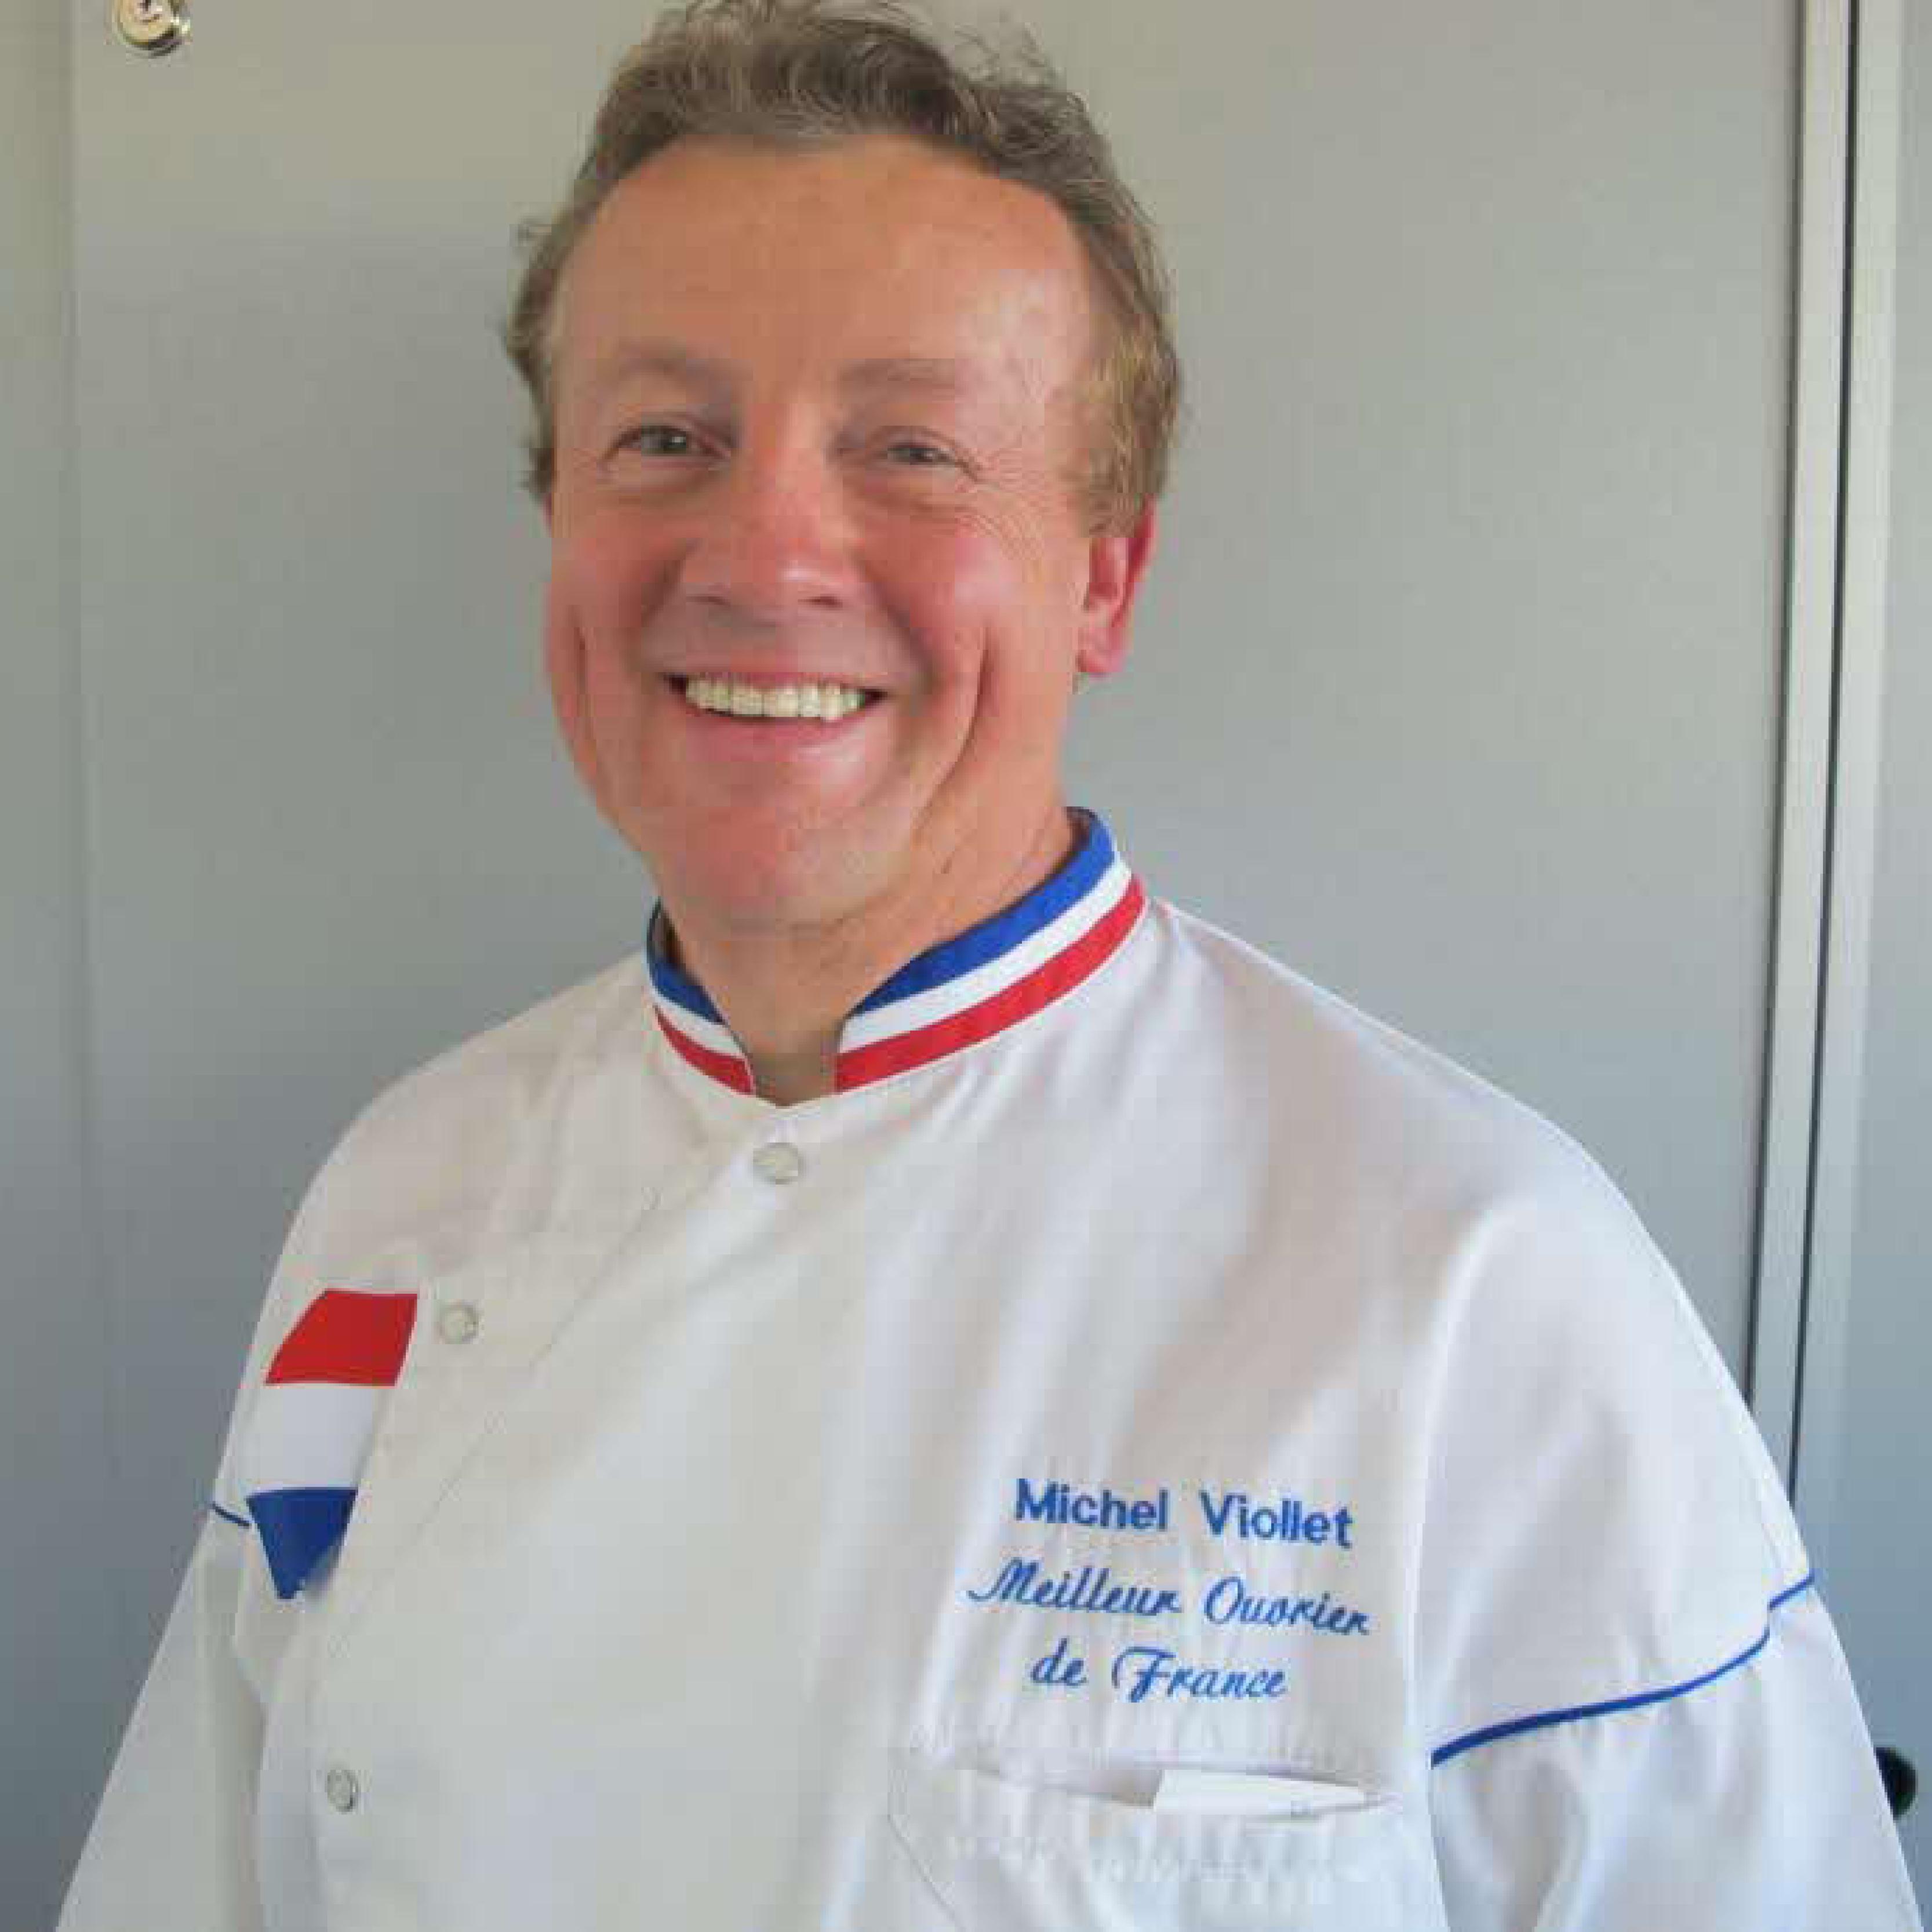 Michel Violet